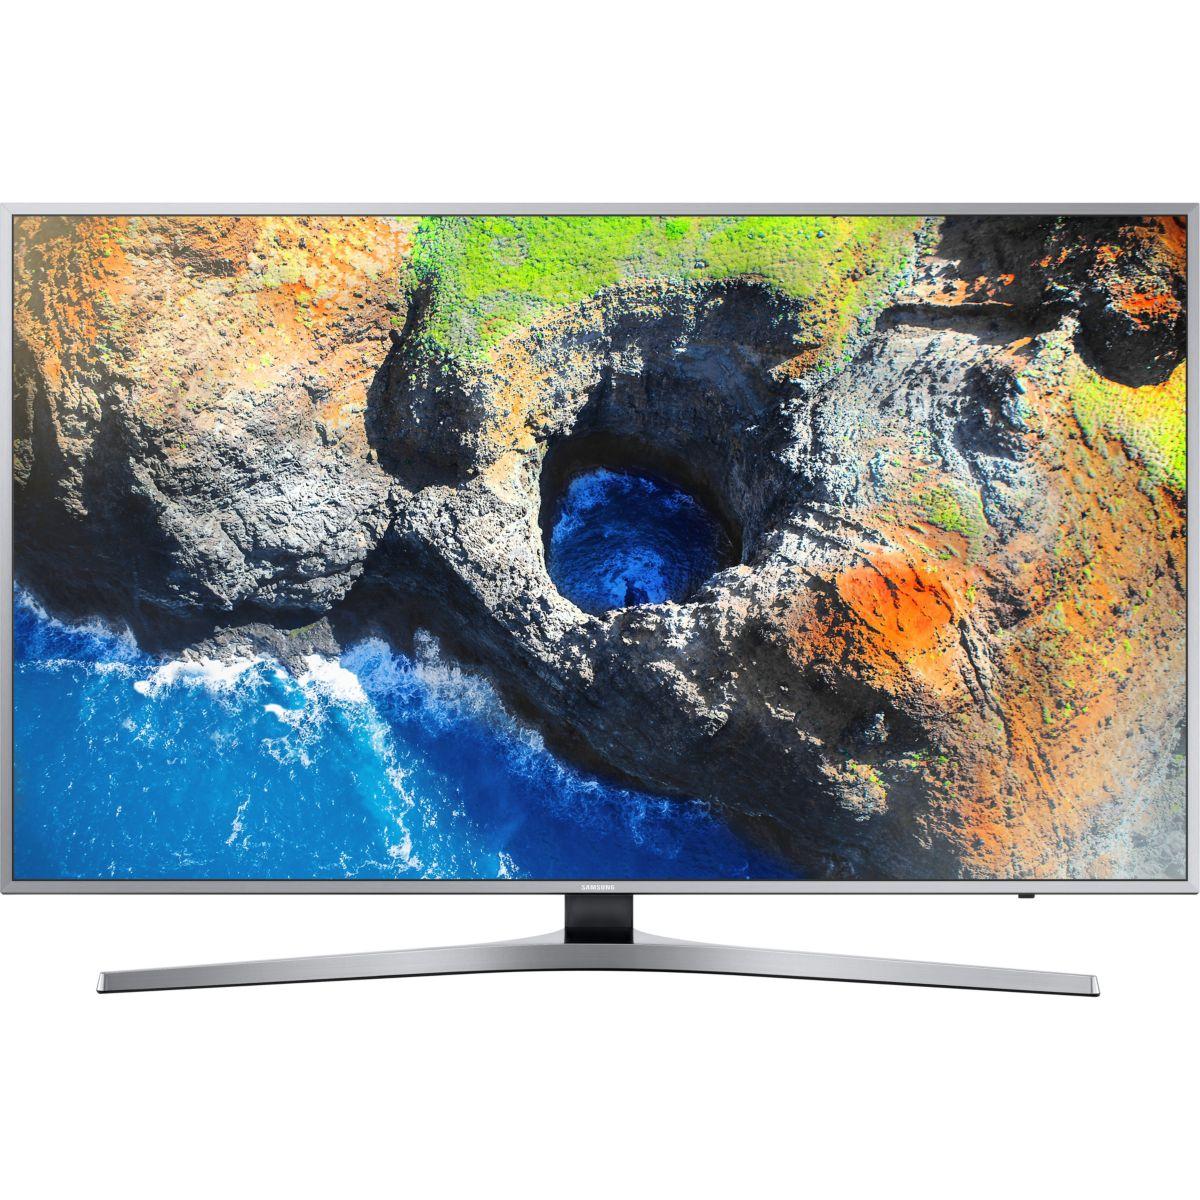 TV SAMSUNG UE40MU6405 4K HDR SMART CRYST